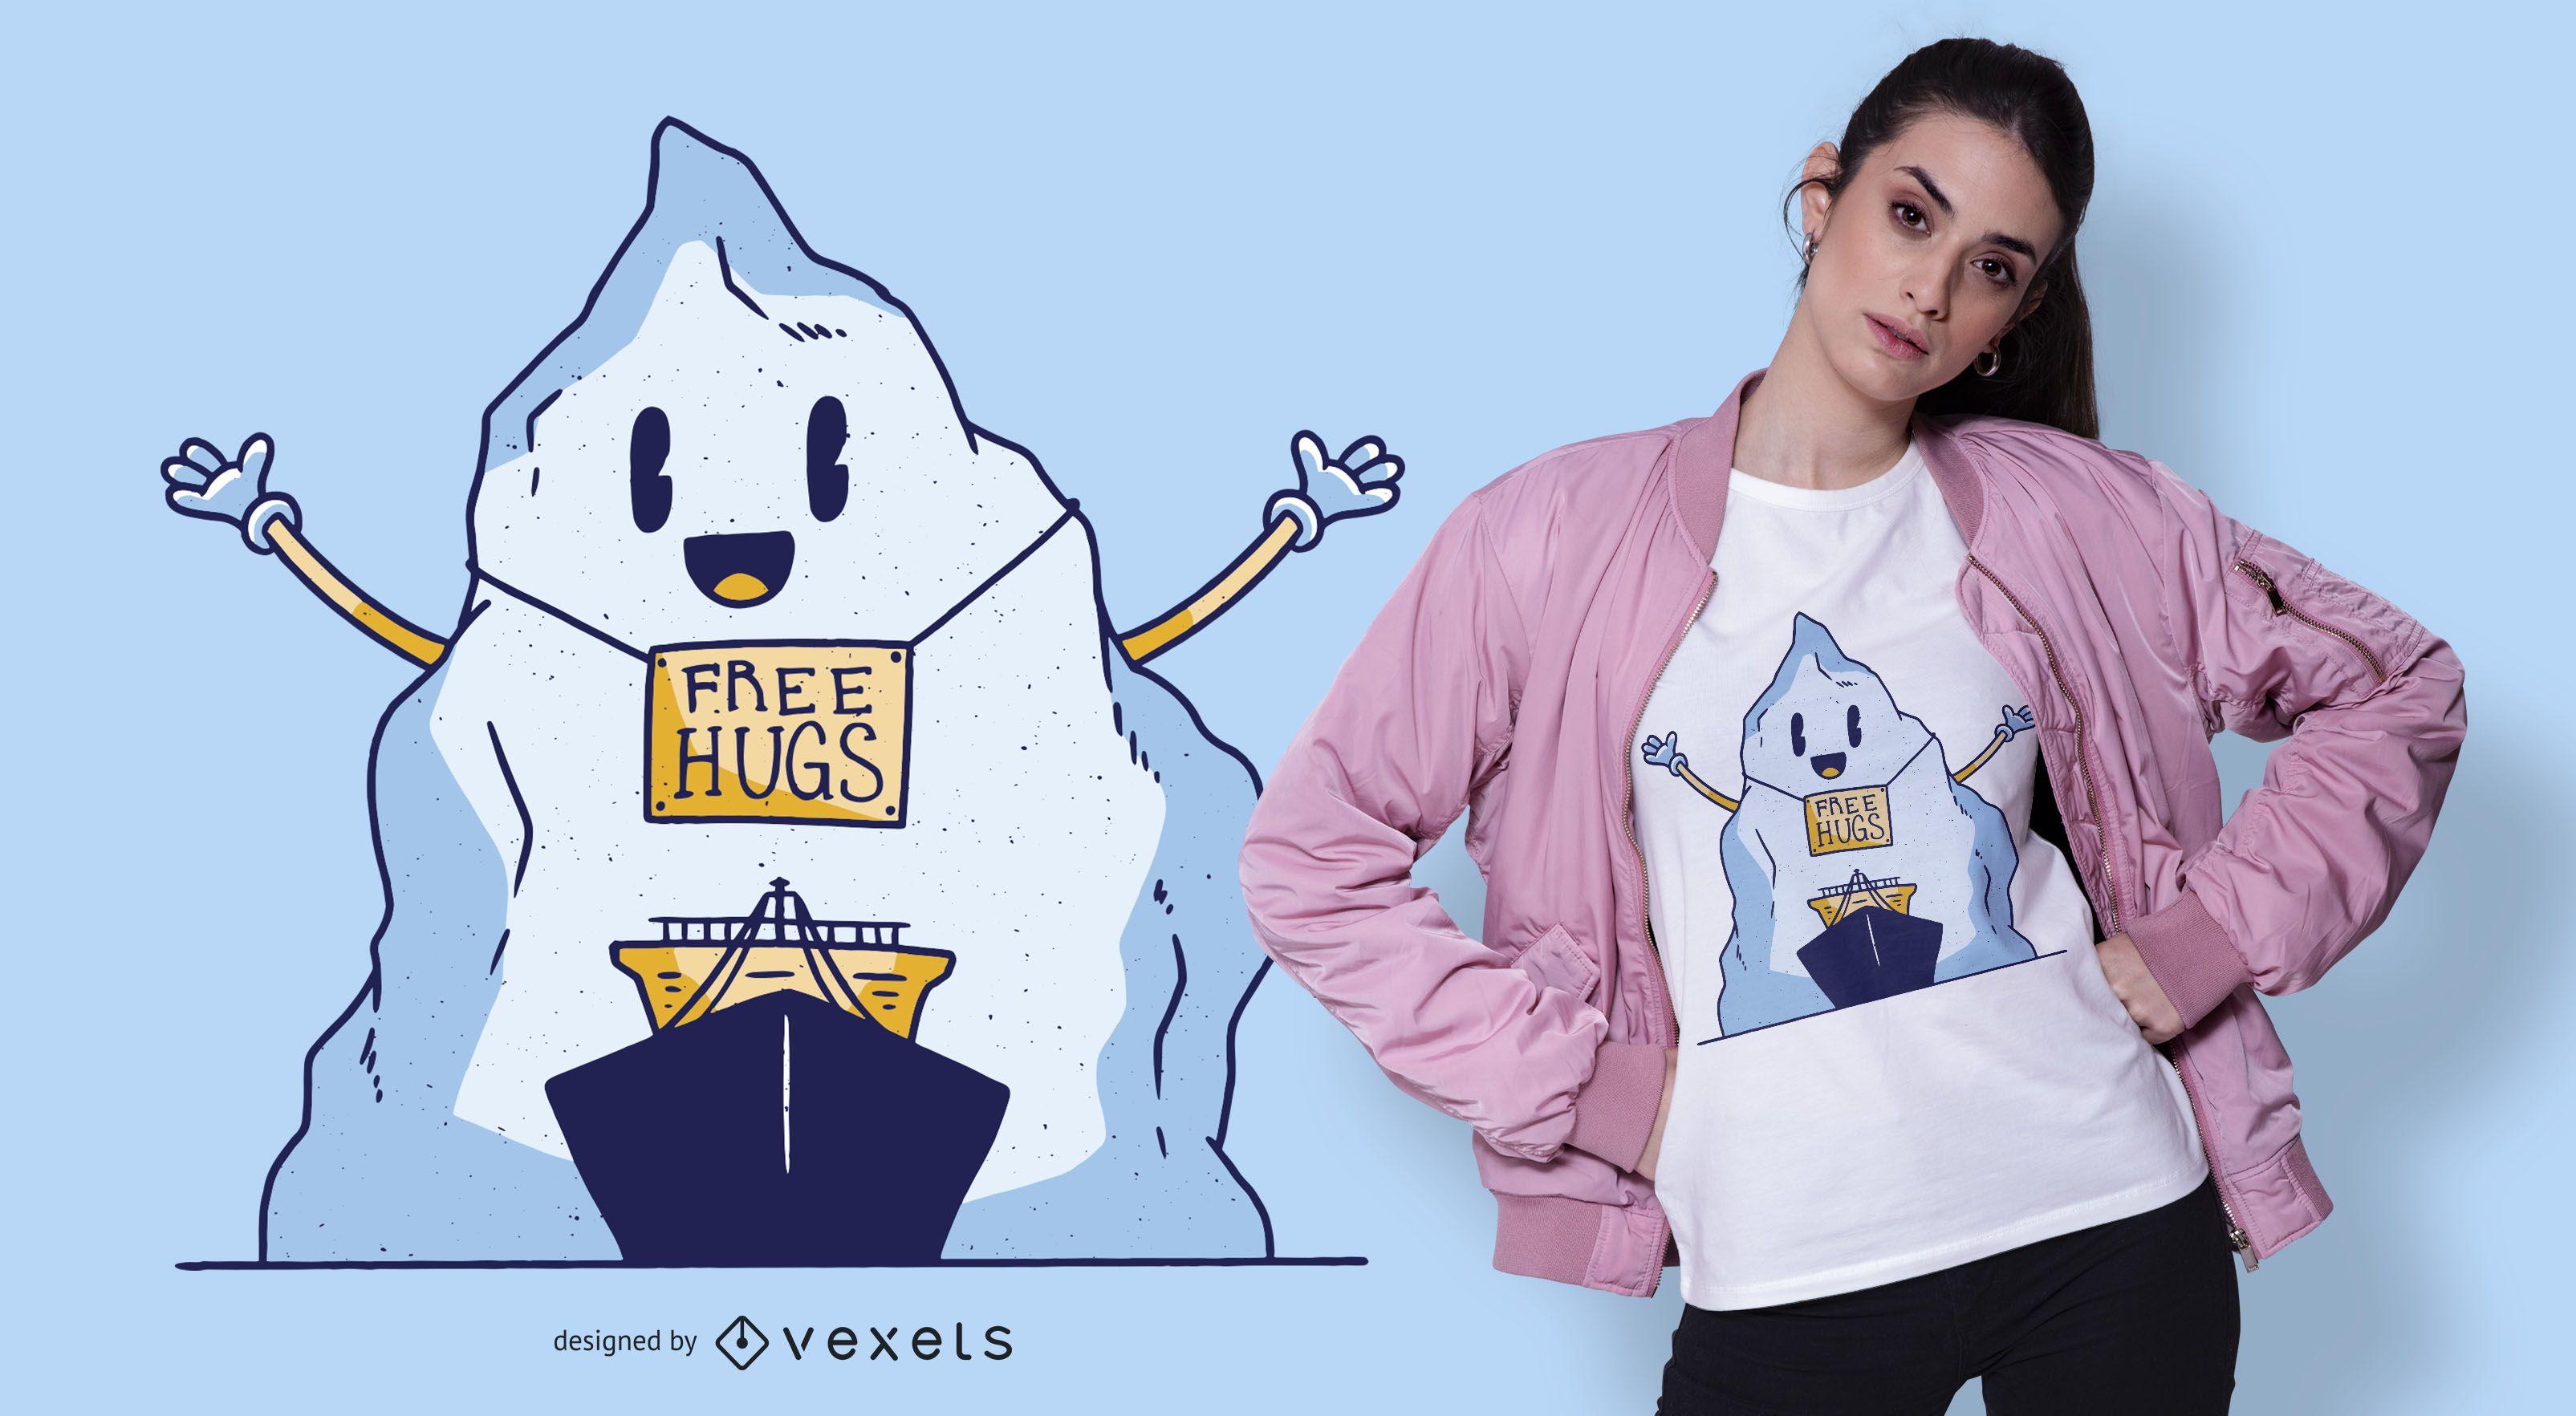 Free hugs iceberg t-shirt design